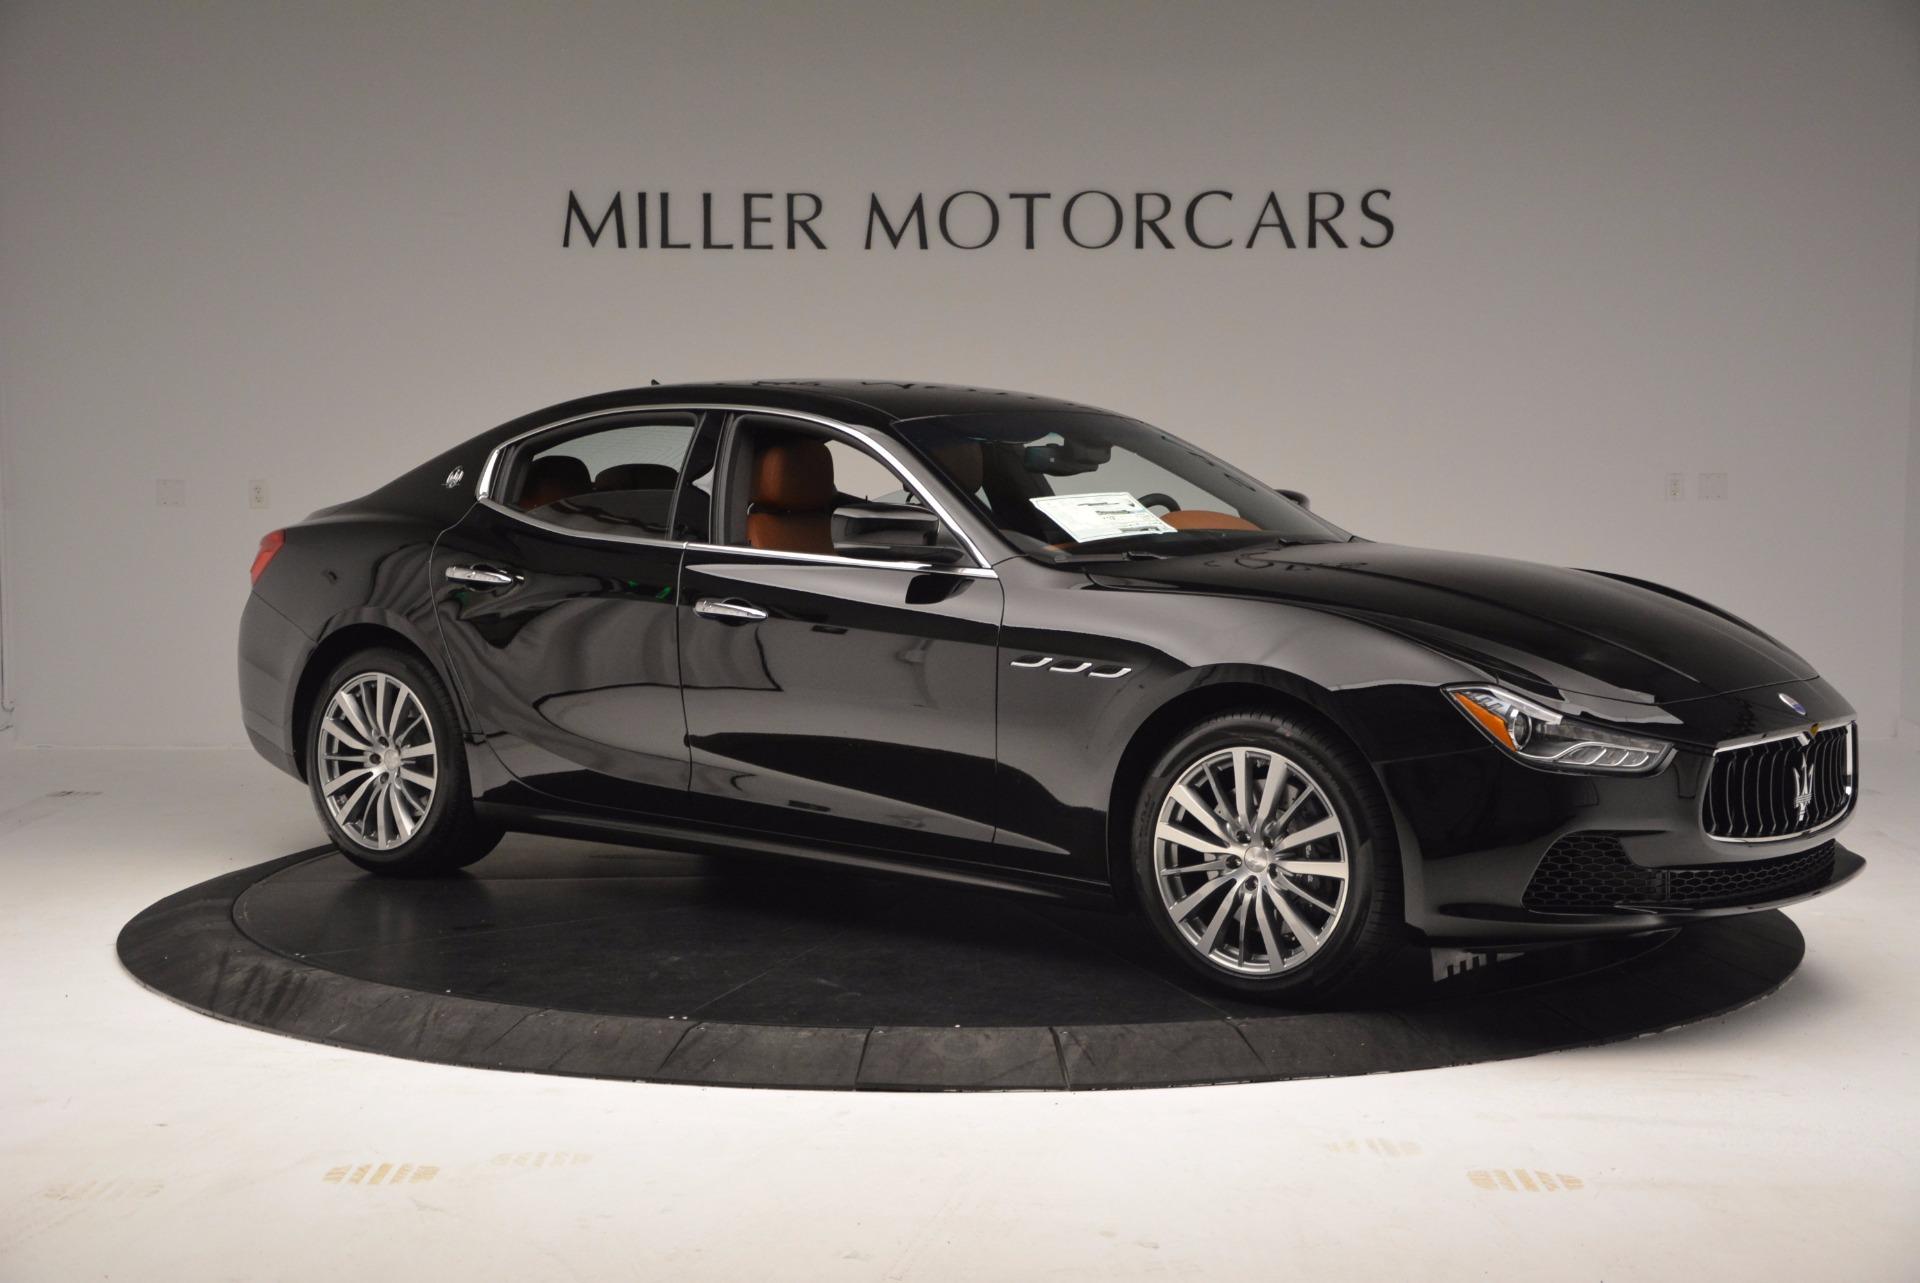 Used 2017 Maserati Ghibli S Q4 EX-Loaner For Sale In Greenwich, CT 776_p10